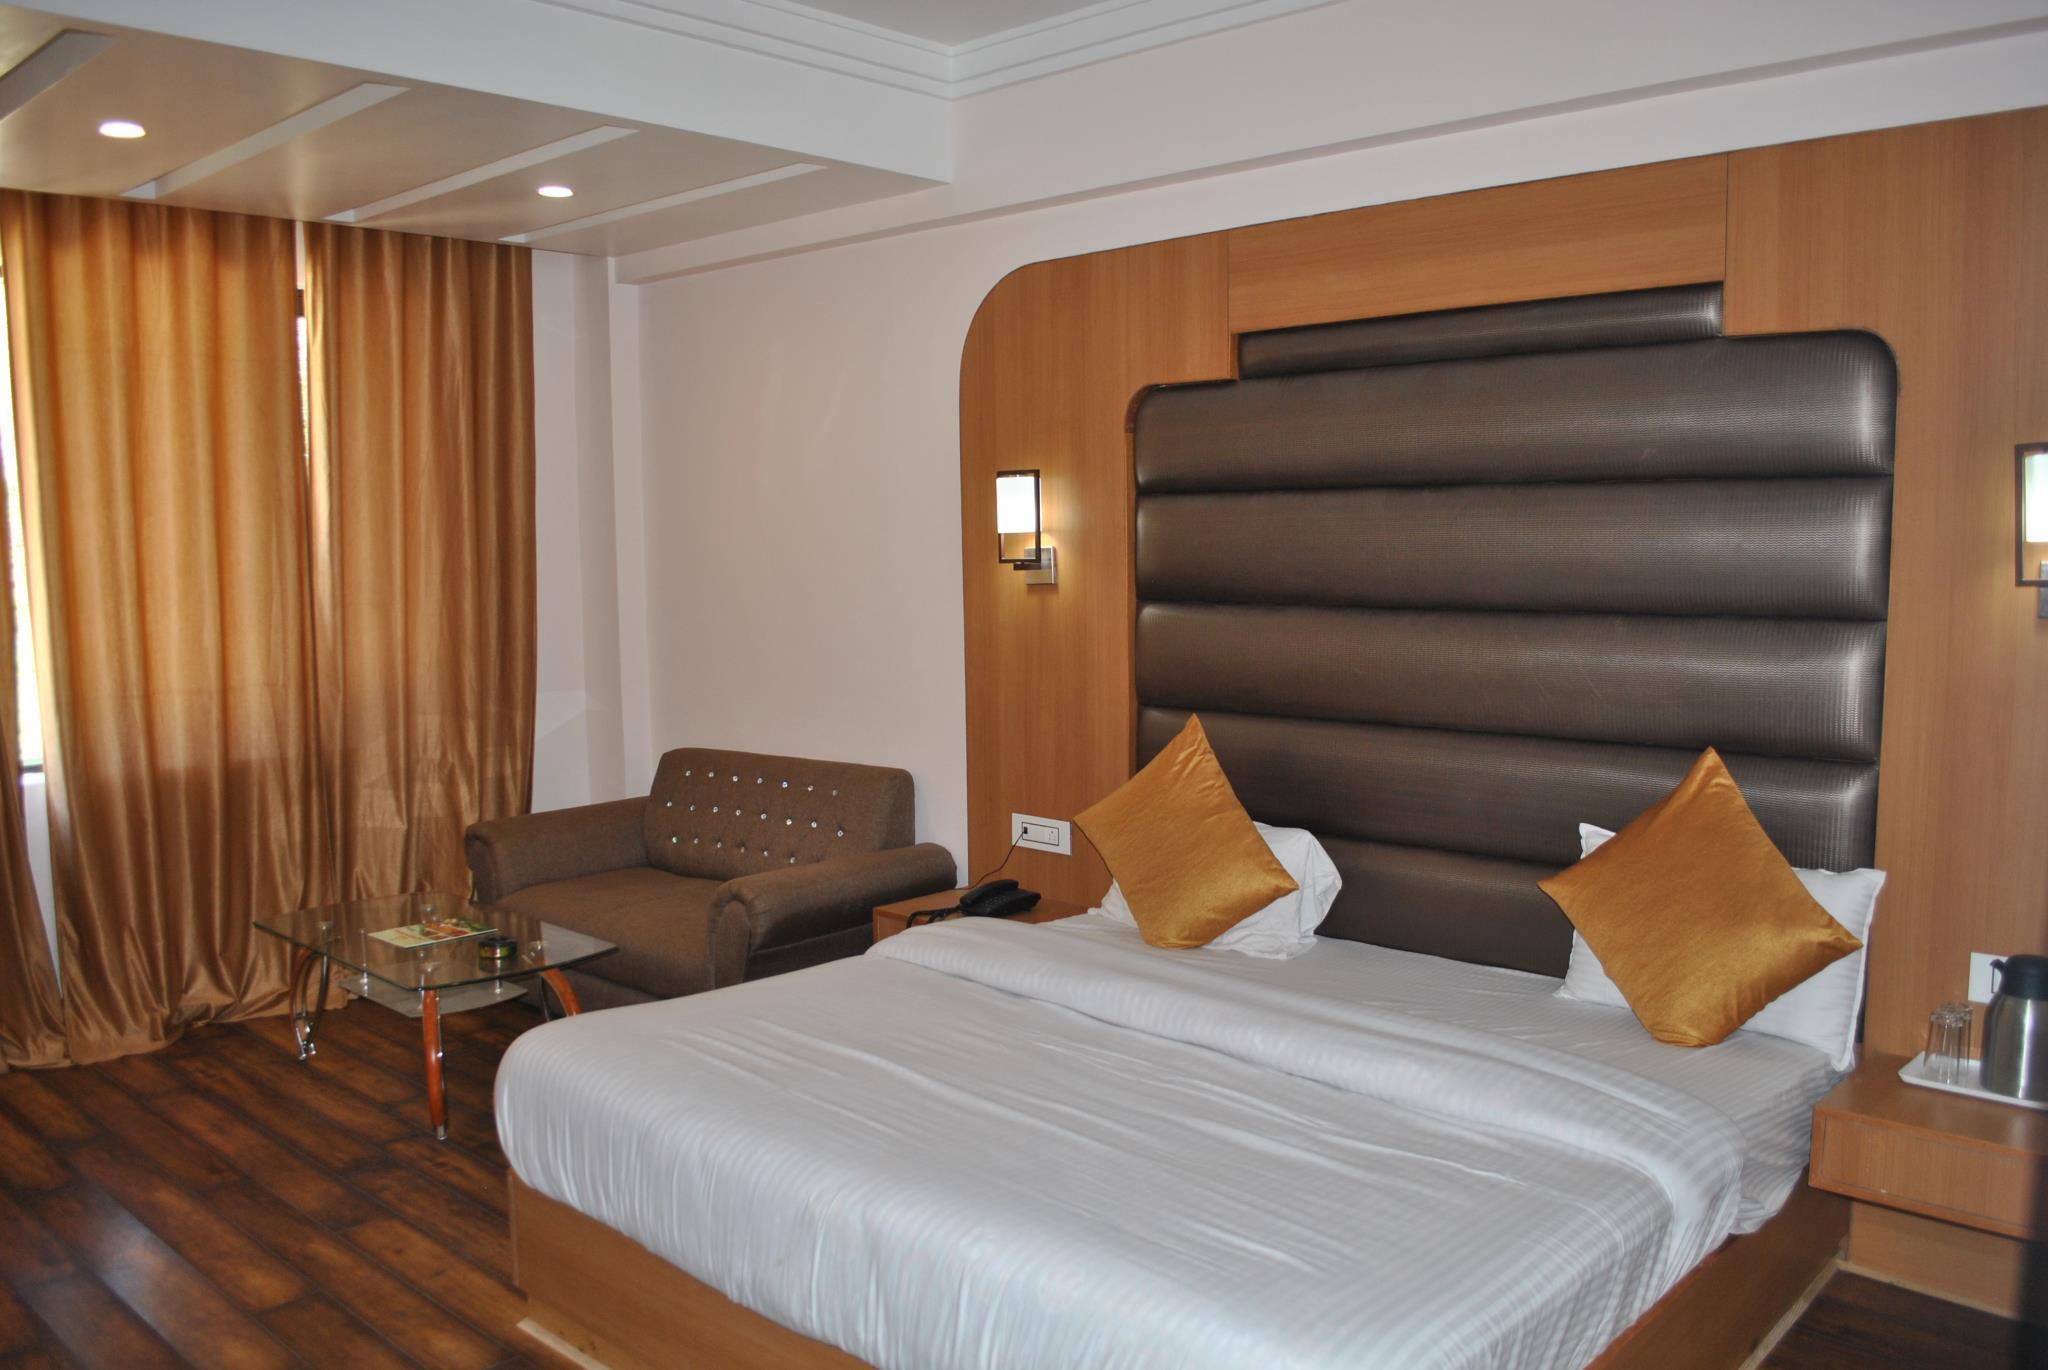 Hotel Jai Skahan Patnitop Hotel Natraj International In India Asia